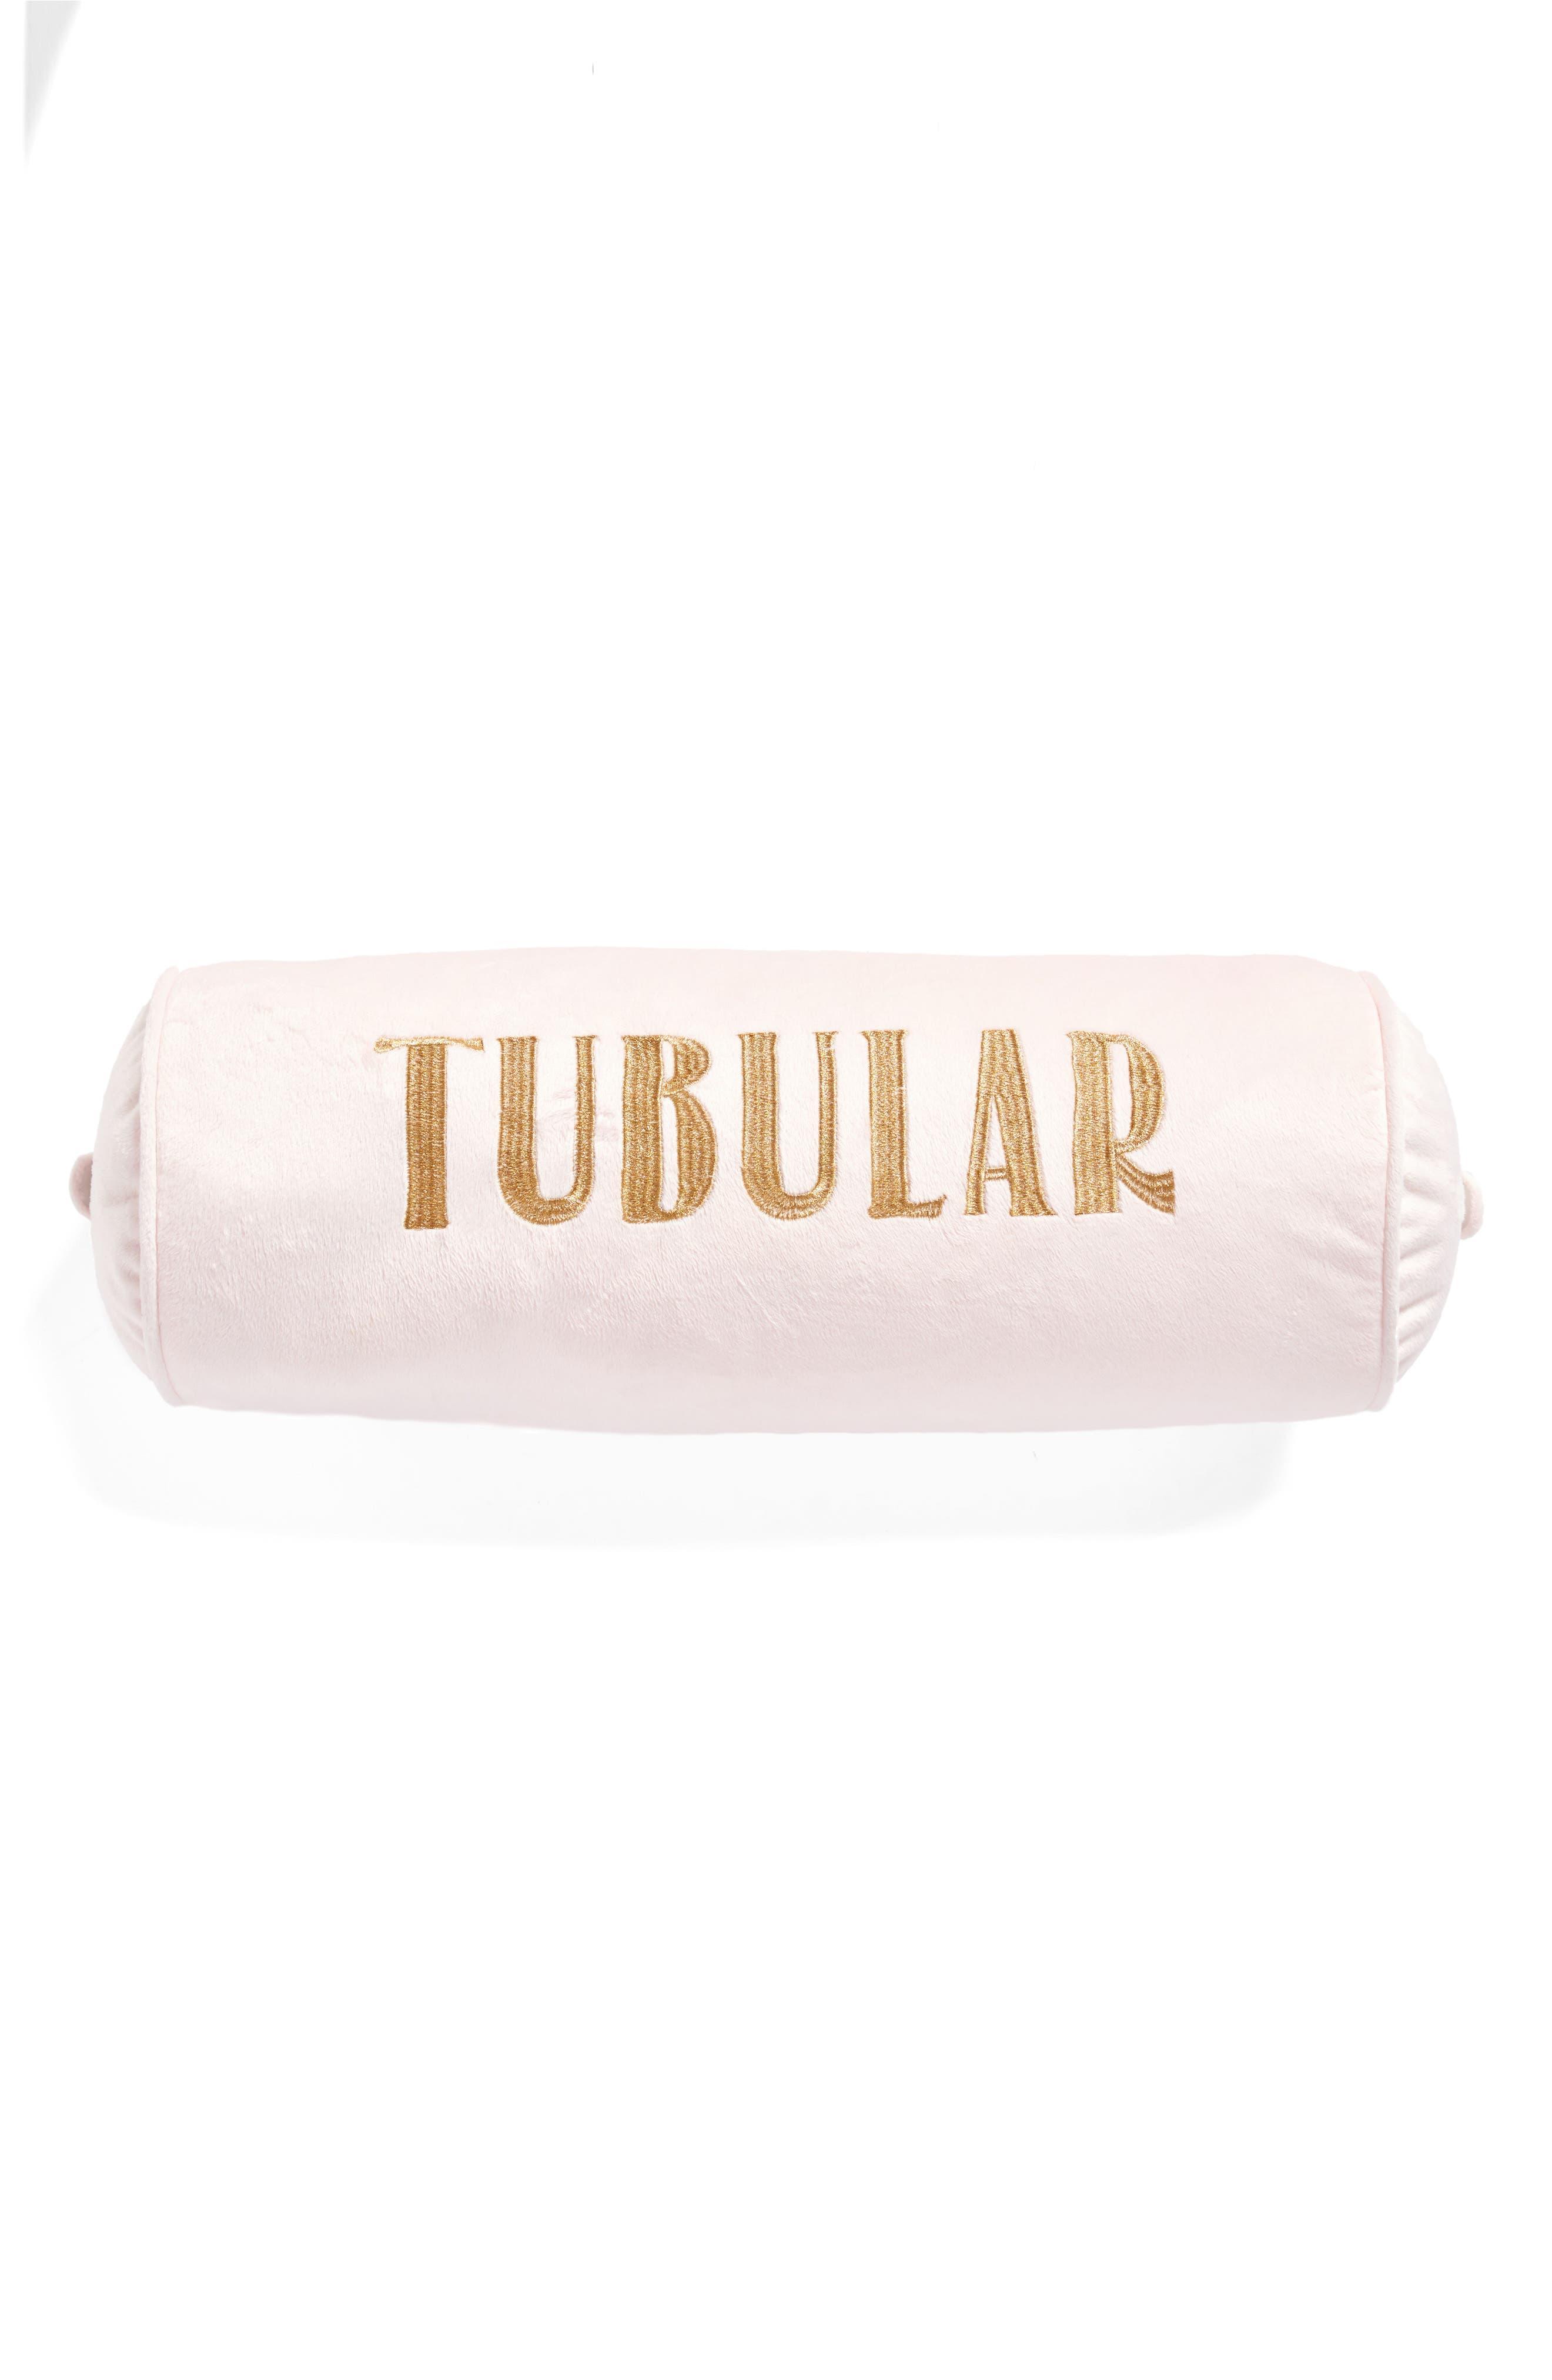 Tubular Neckroll Pillow,                         Main,                         color,